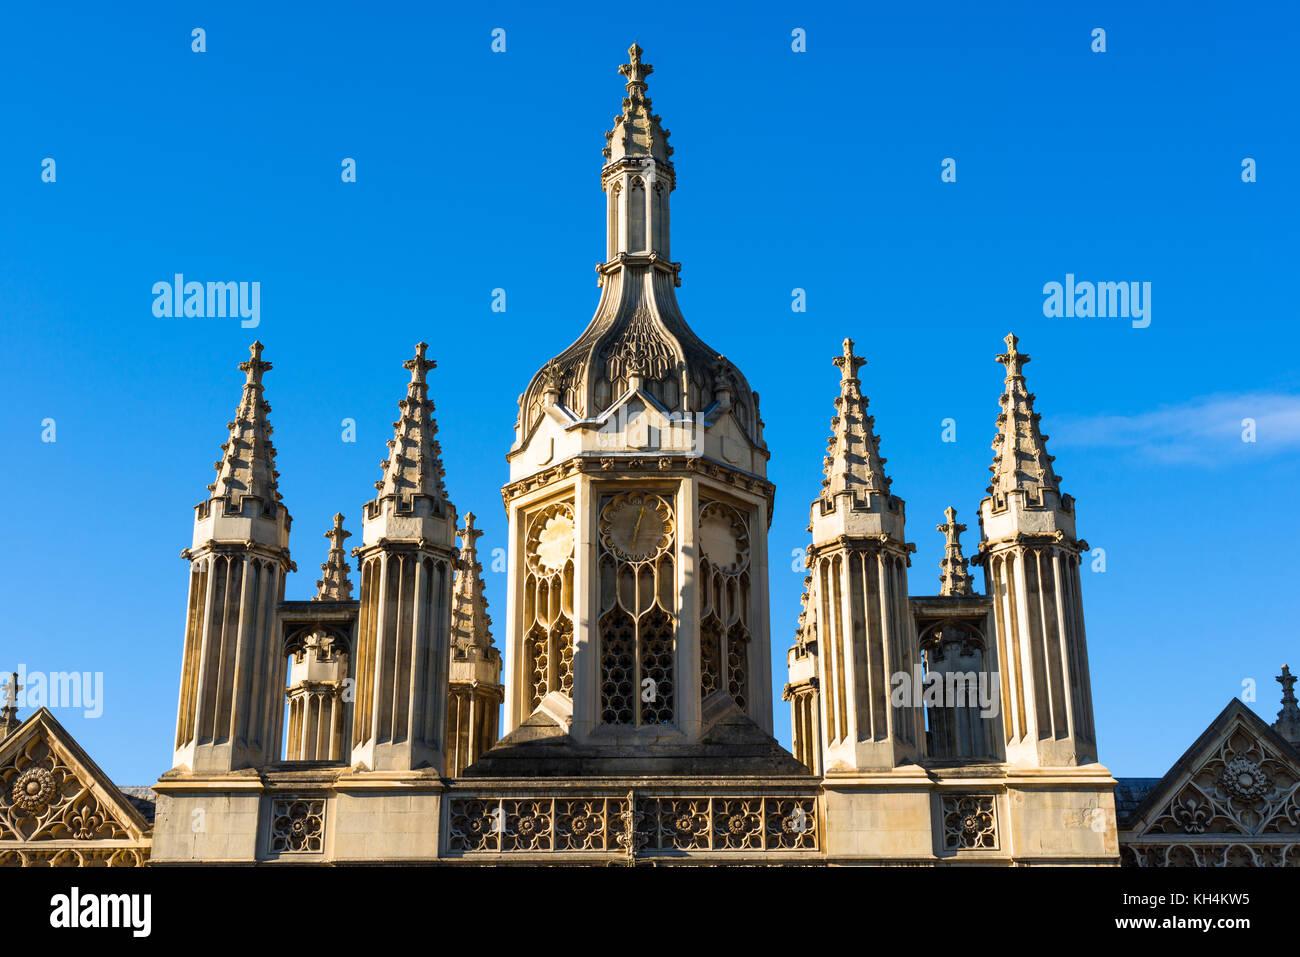 Clock tower as part of Kings College Main gatehouse on Kings Parade. Cambridge, Cambridgeshire, England, UK. - Stock Image